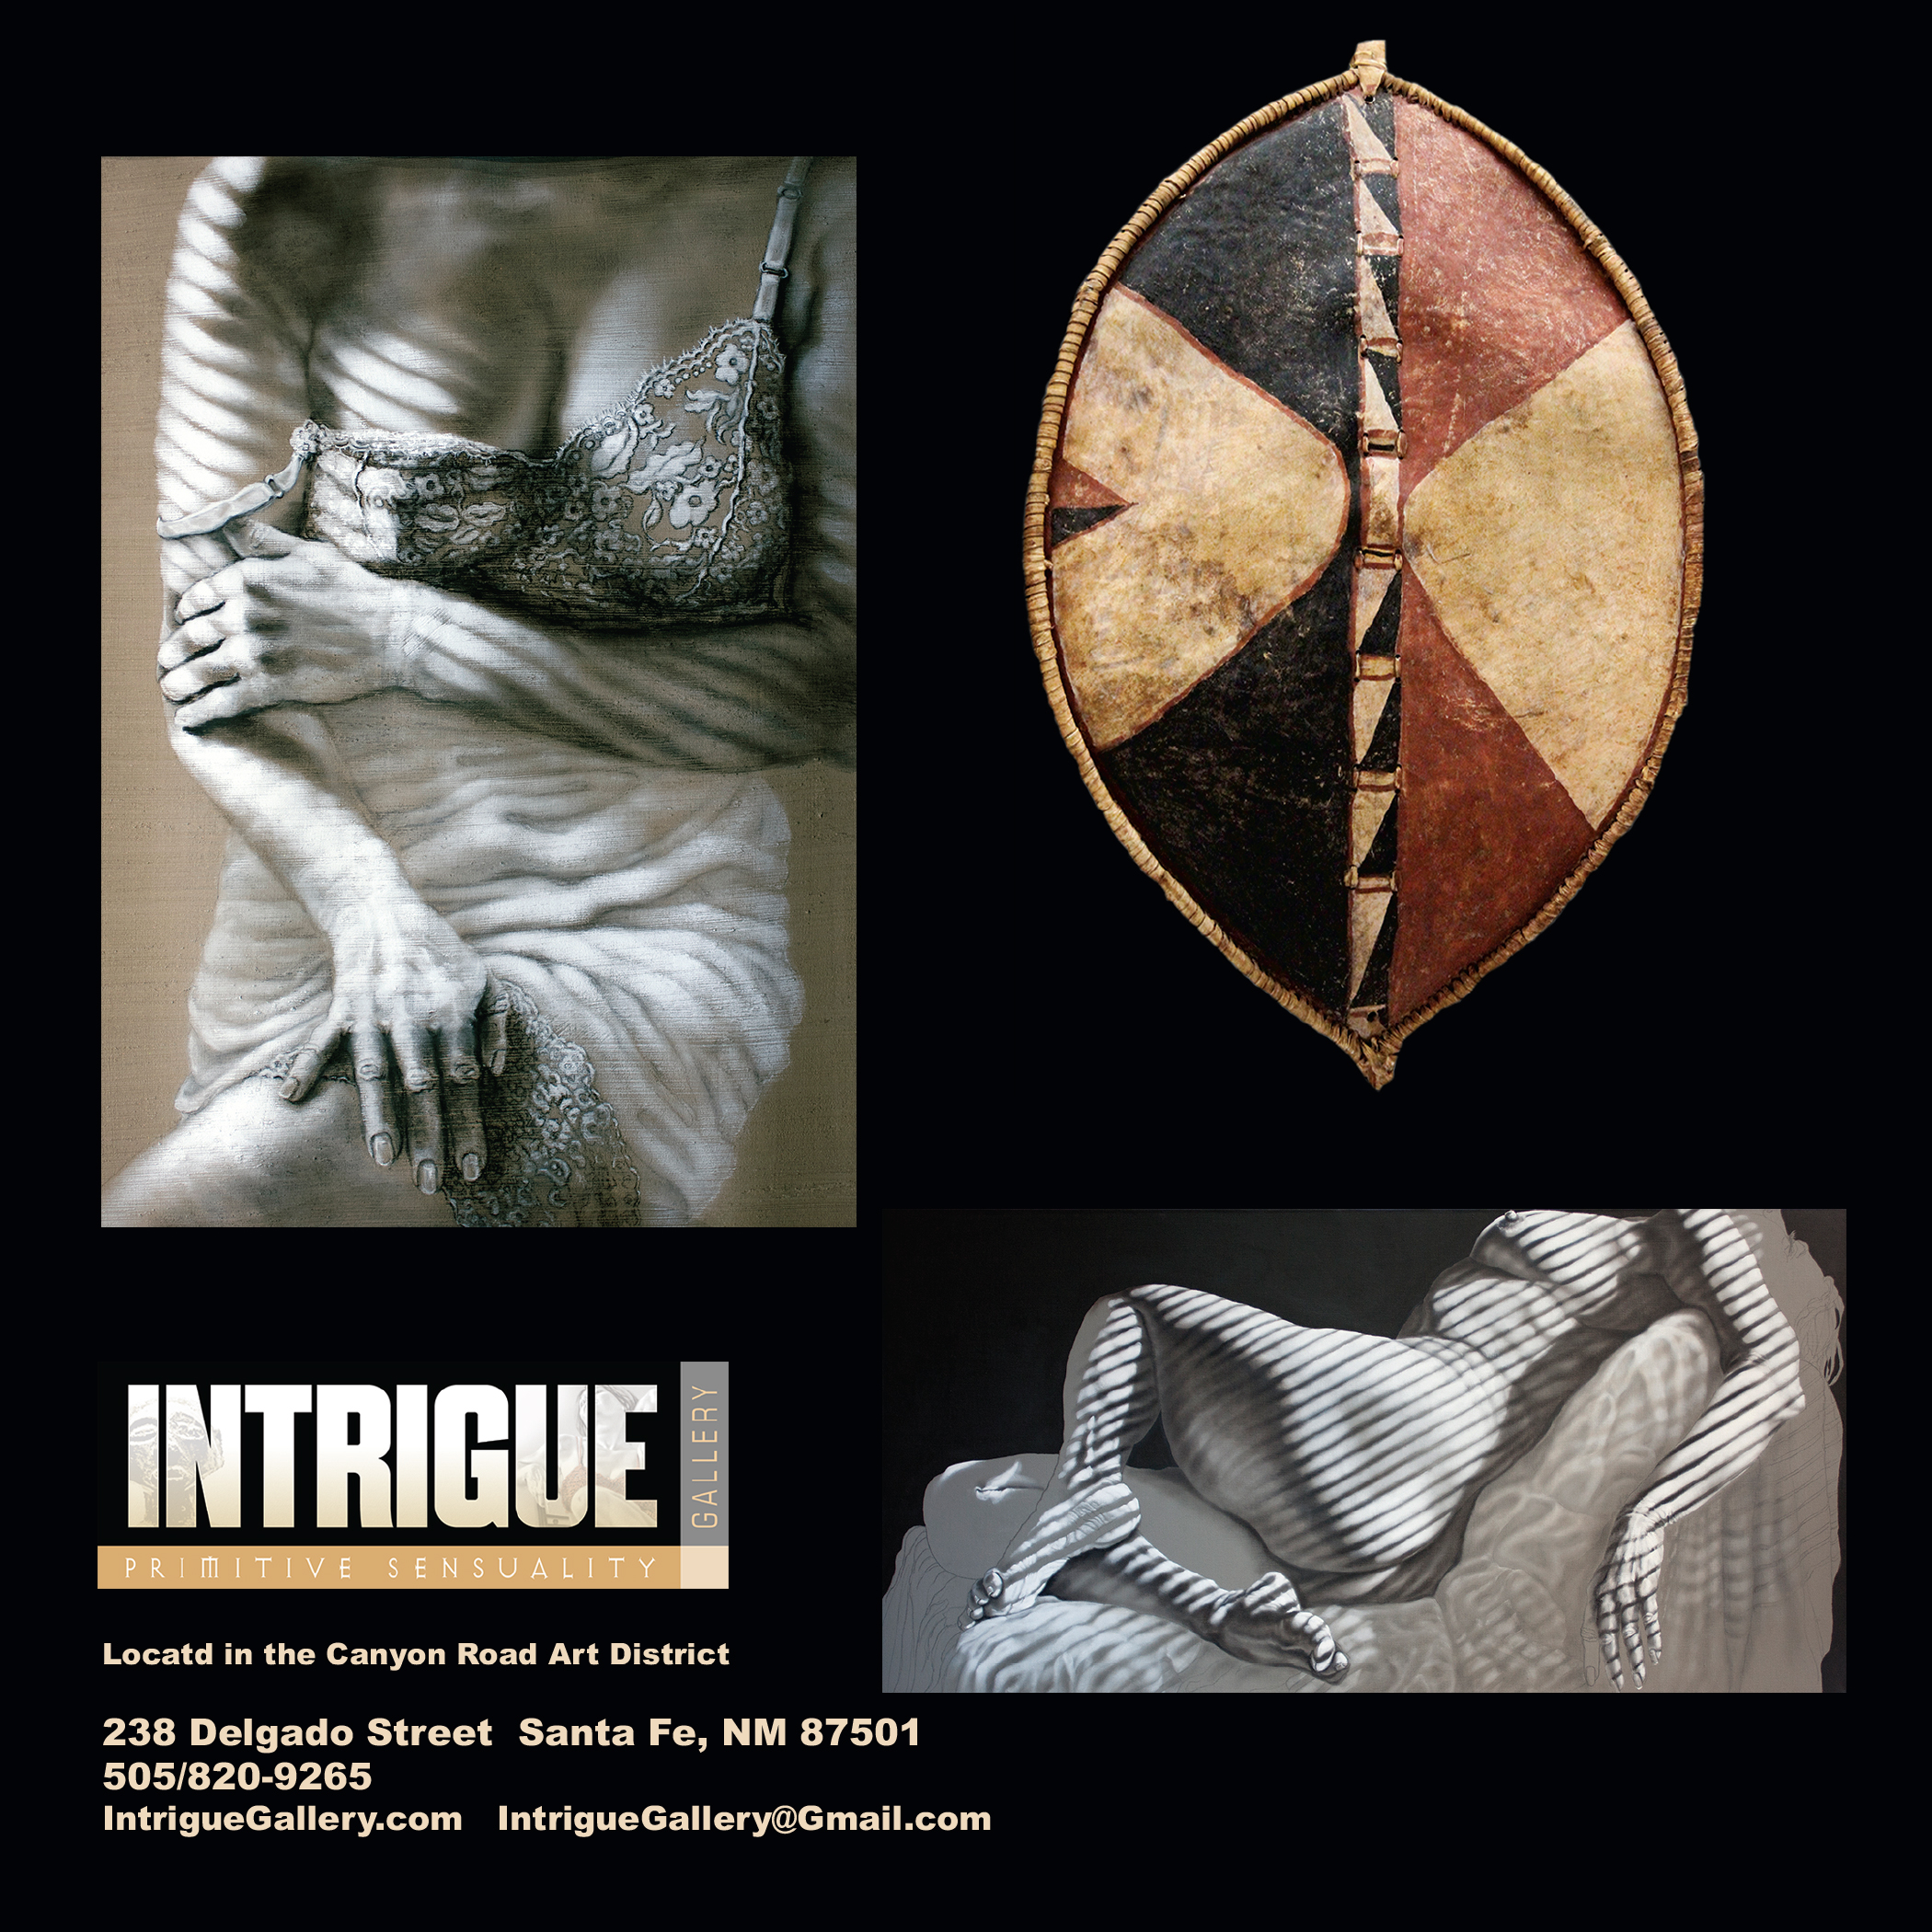 Intrigue-EG-SFT2017-18-Ad.jpg